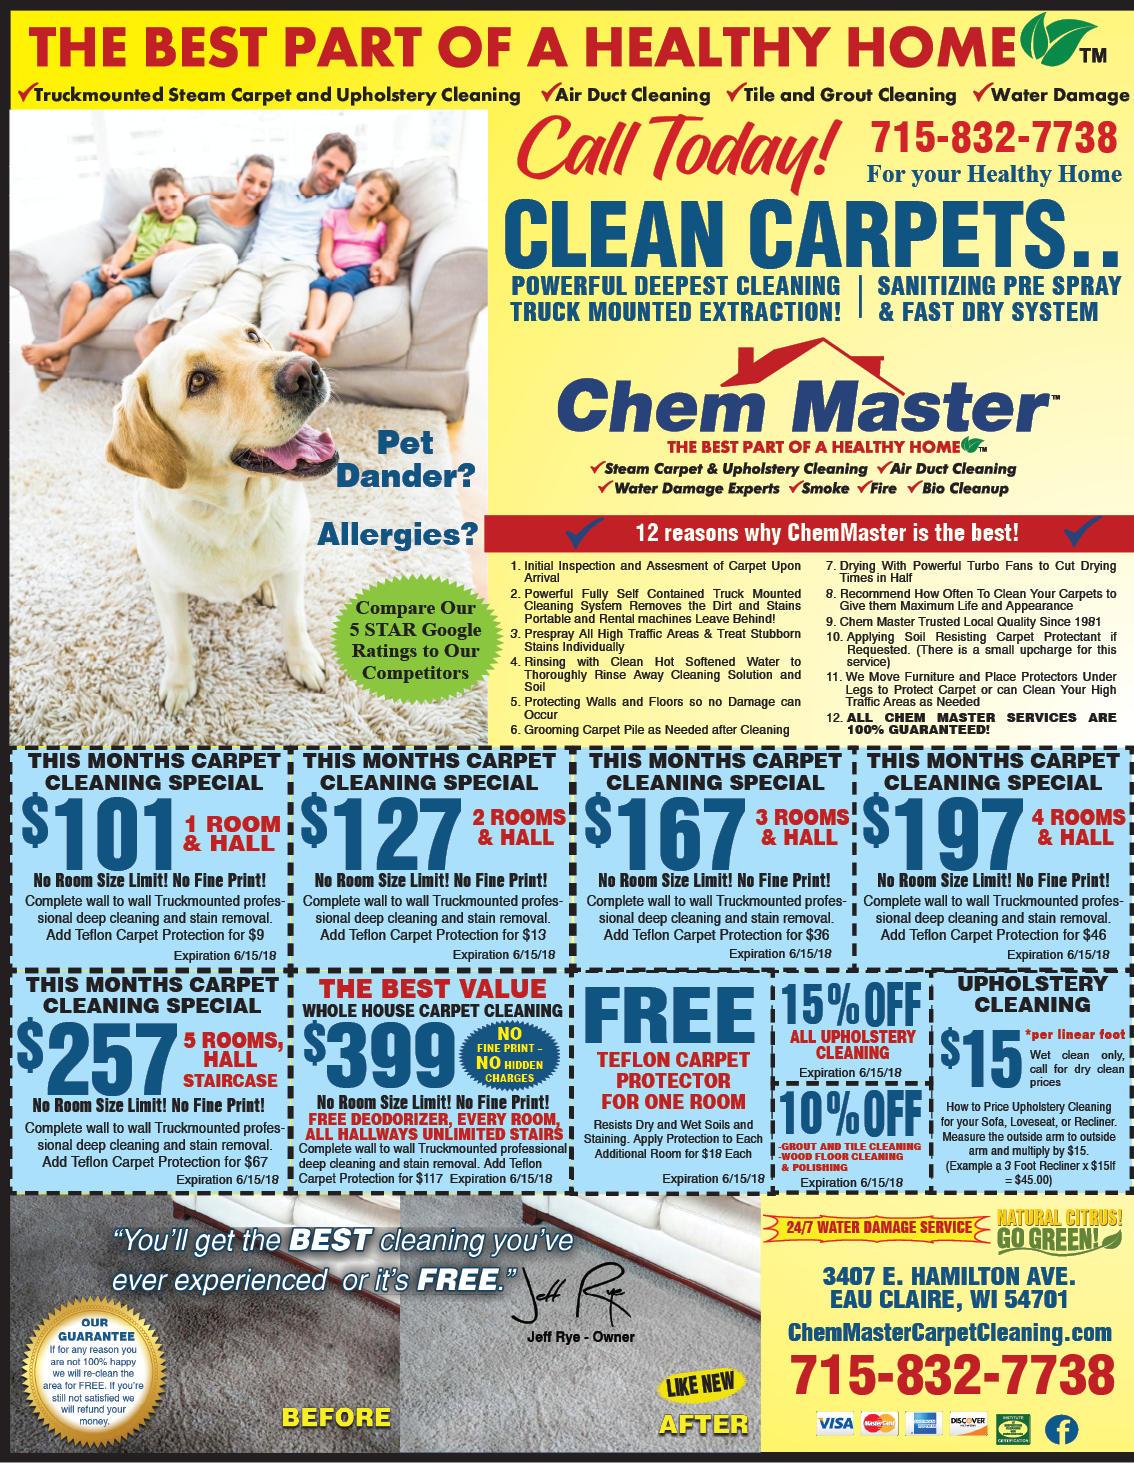 Chem Master Carpet Cleaning And Restoration image 13